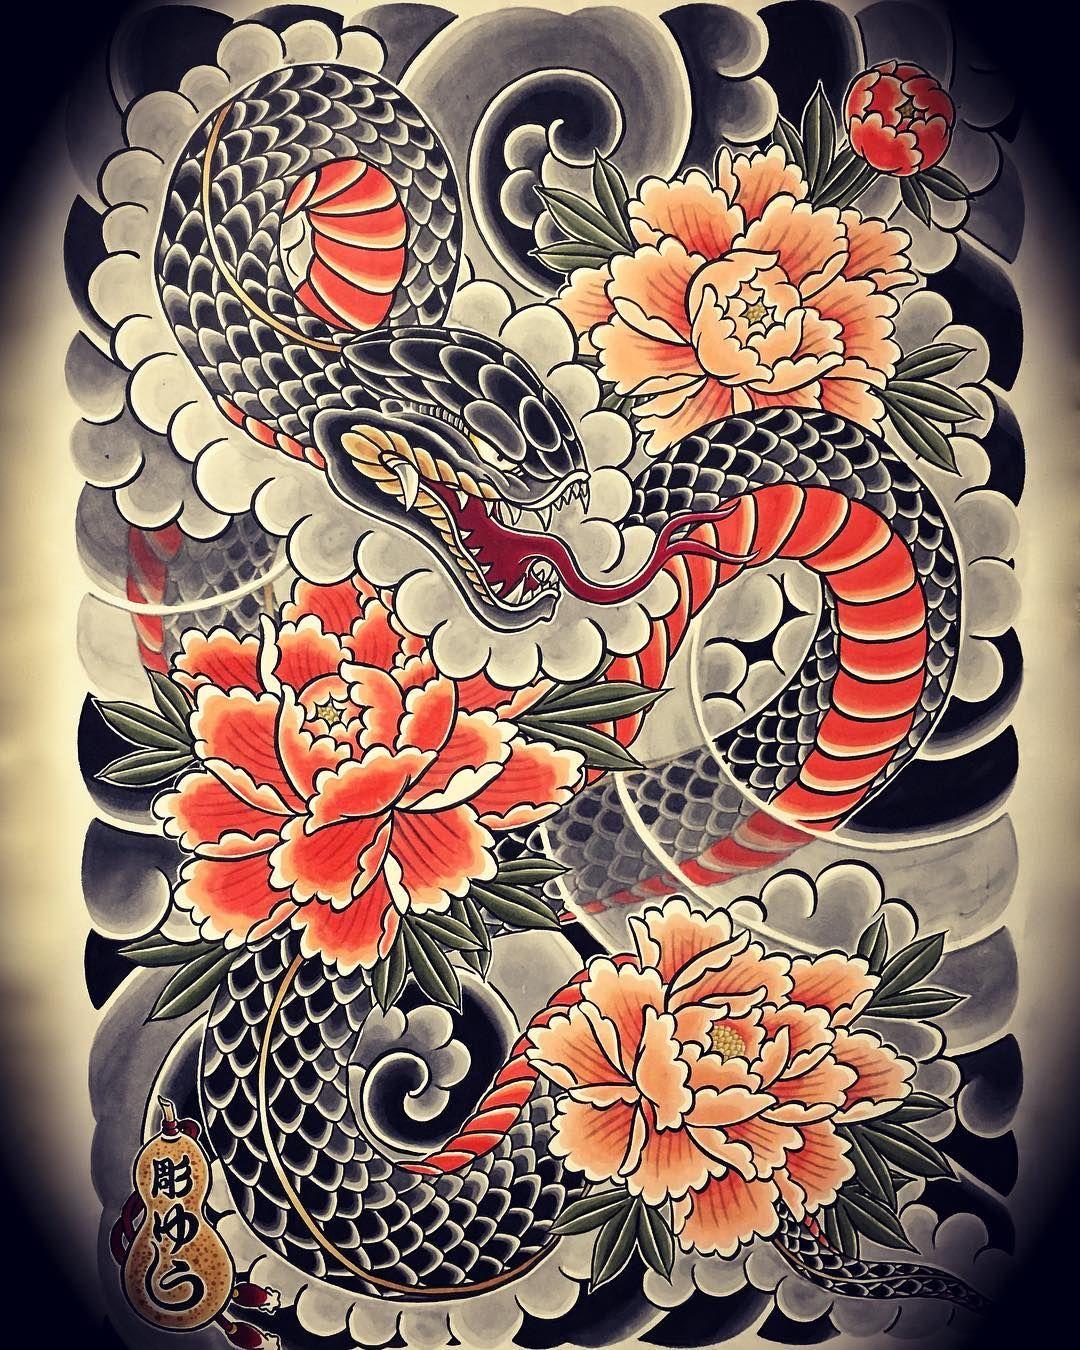 Snake serpent Tattoo japanese style, Japanese tattoo